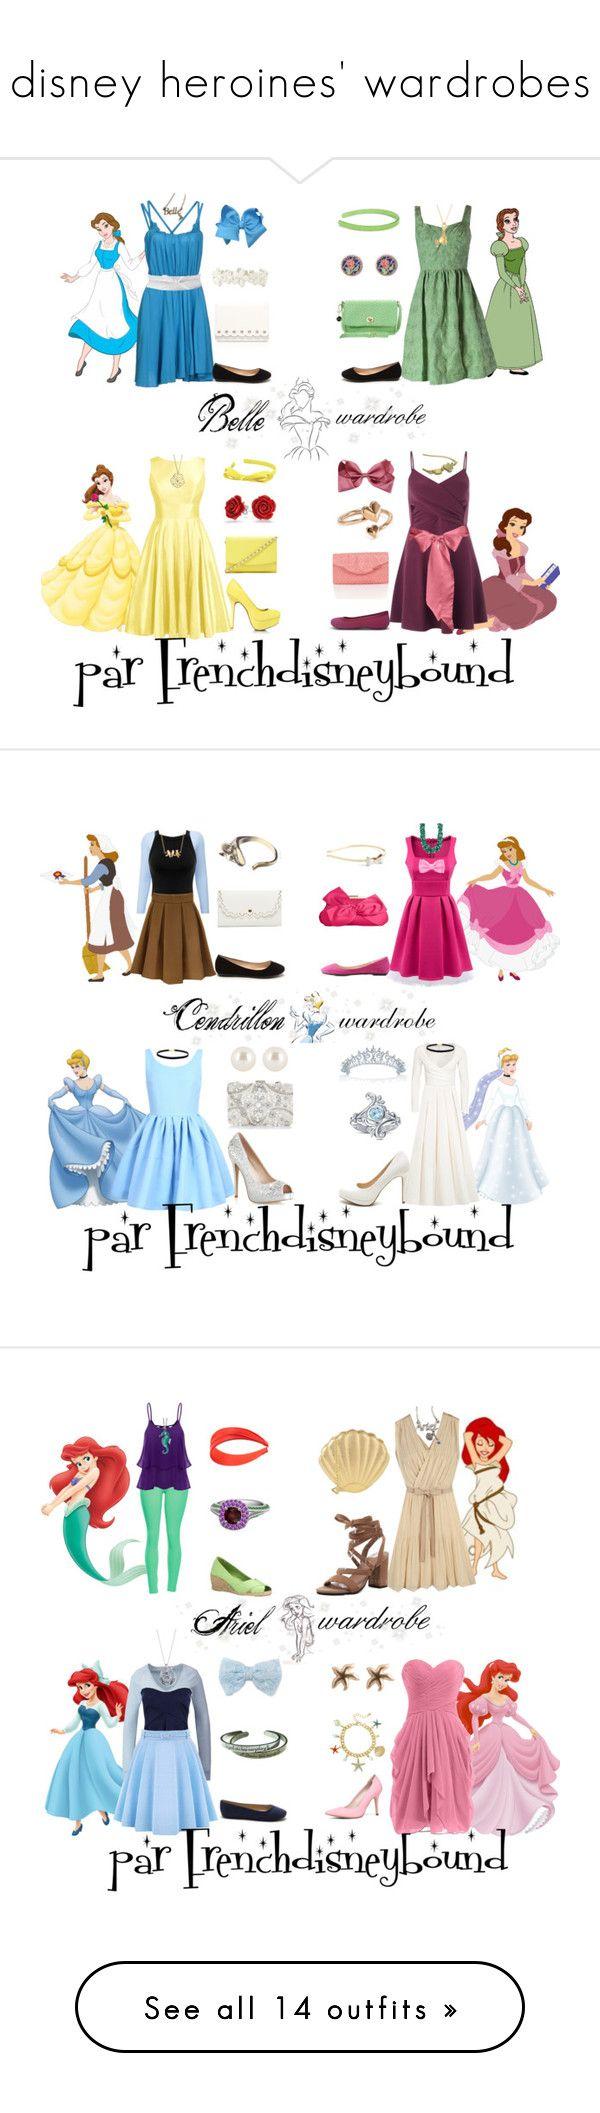 """disney heroines' wardrobes"" by frenchdisneybound ❤ liked on Polyvore featuring disney, disneybound, Antonio Melani, Suoli, Disney, Miss Selfridge, L. Erickson, Lafayette 148 New York, JustFab and ANS"